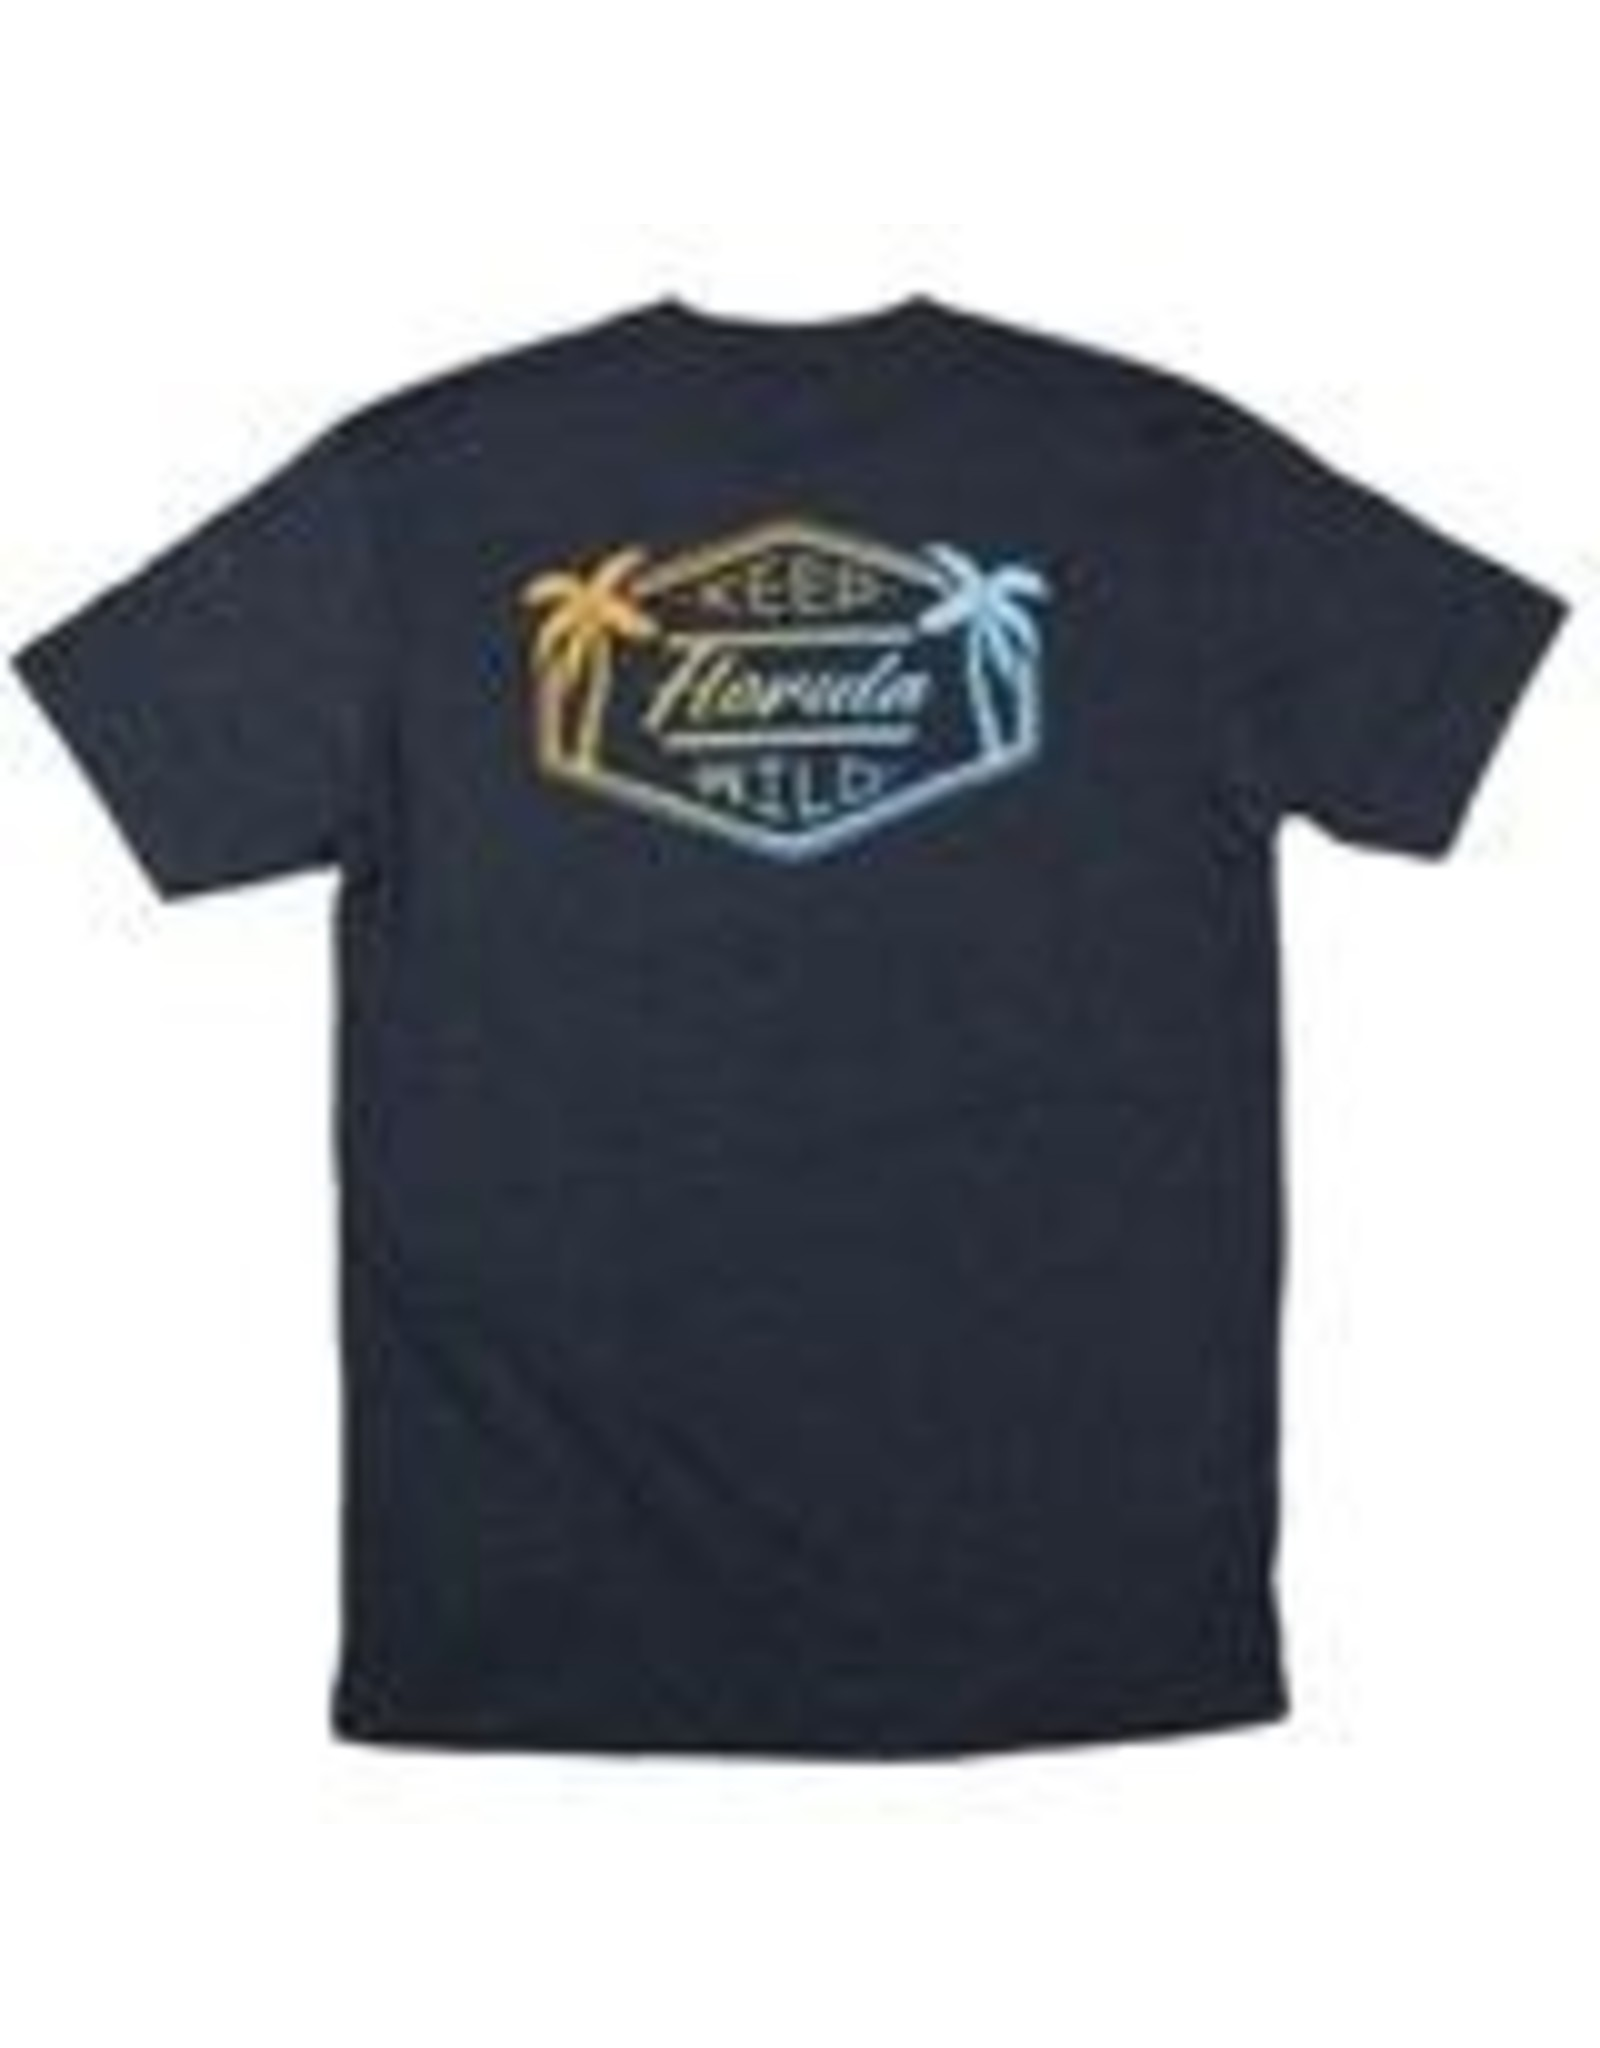 Sunshine State Goods T-Shirt Keep Florida Wild [SS]